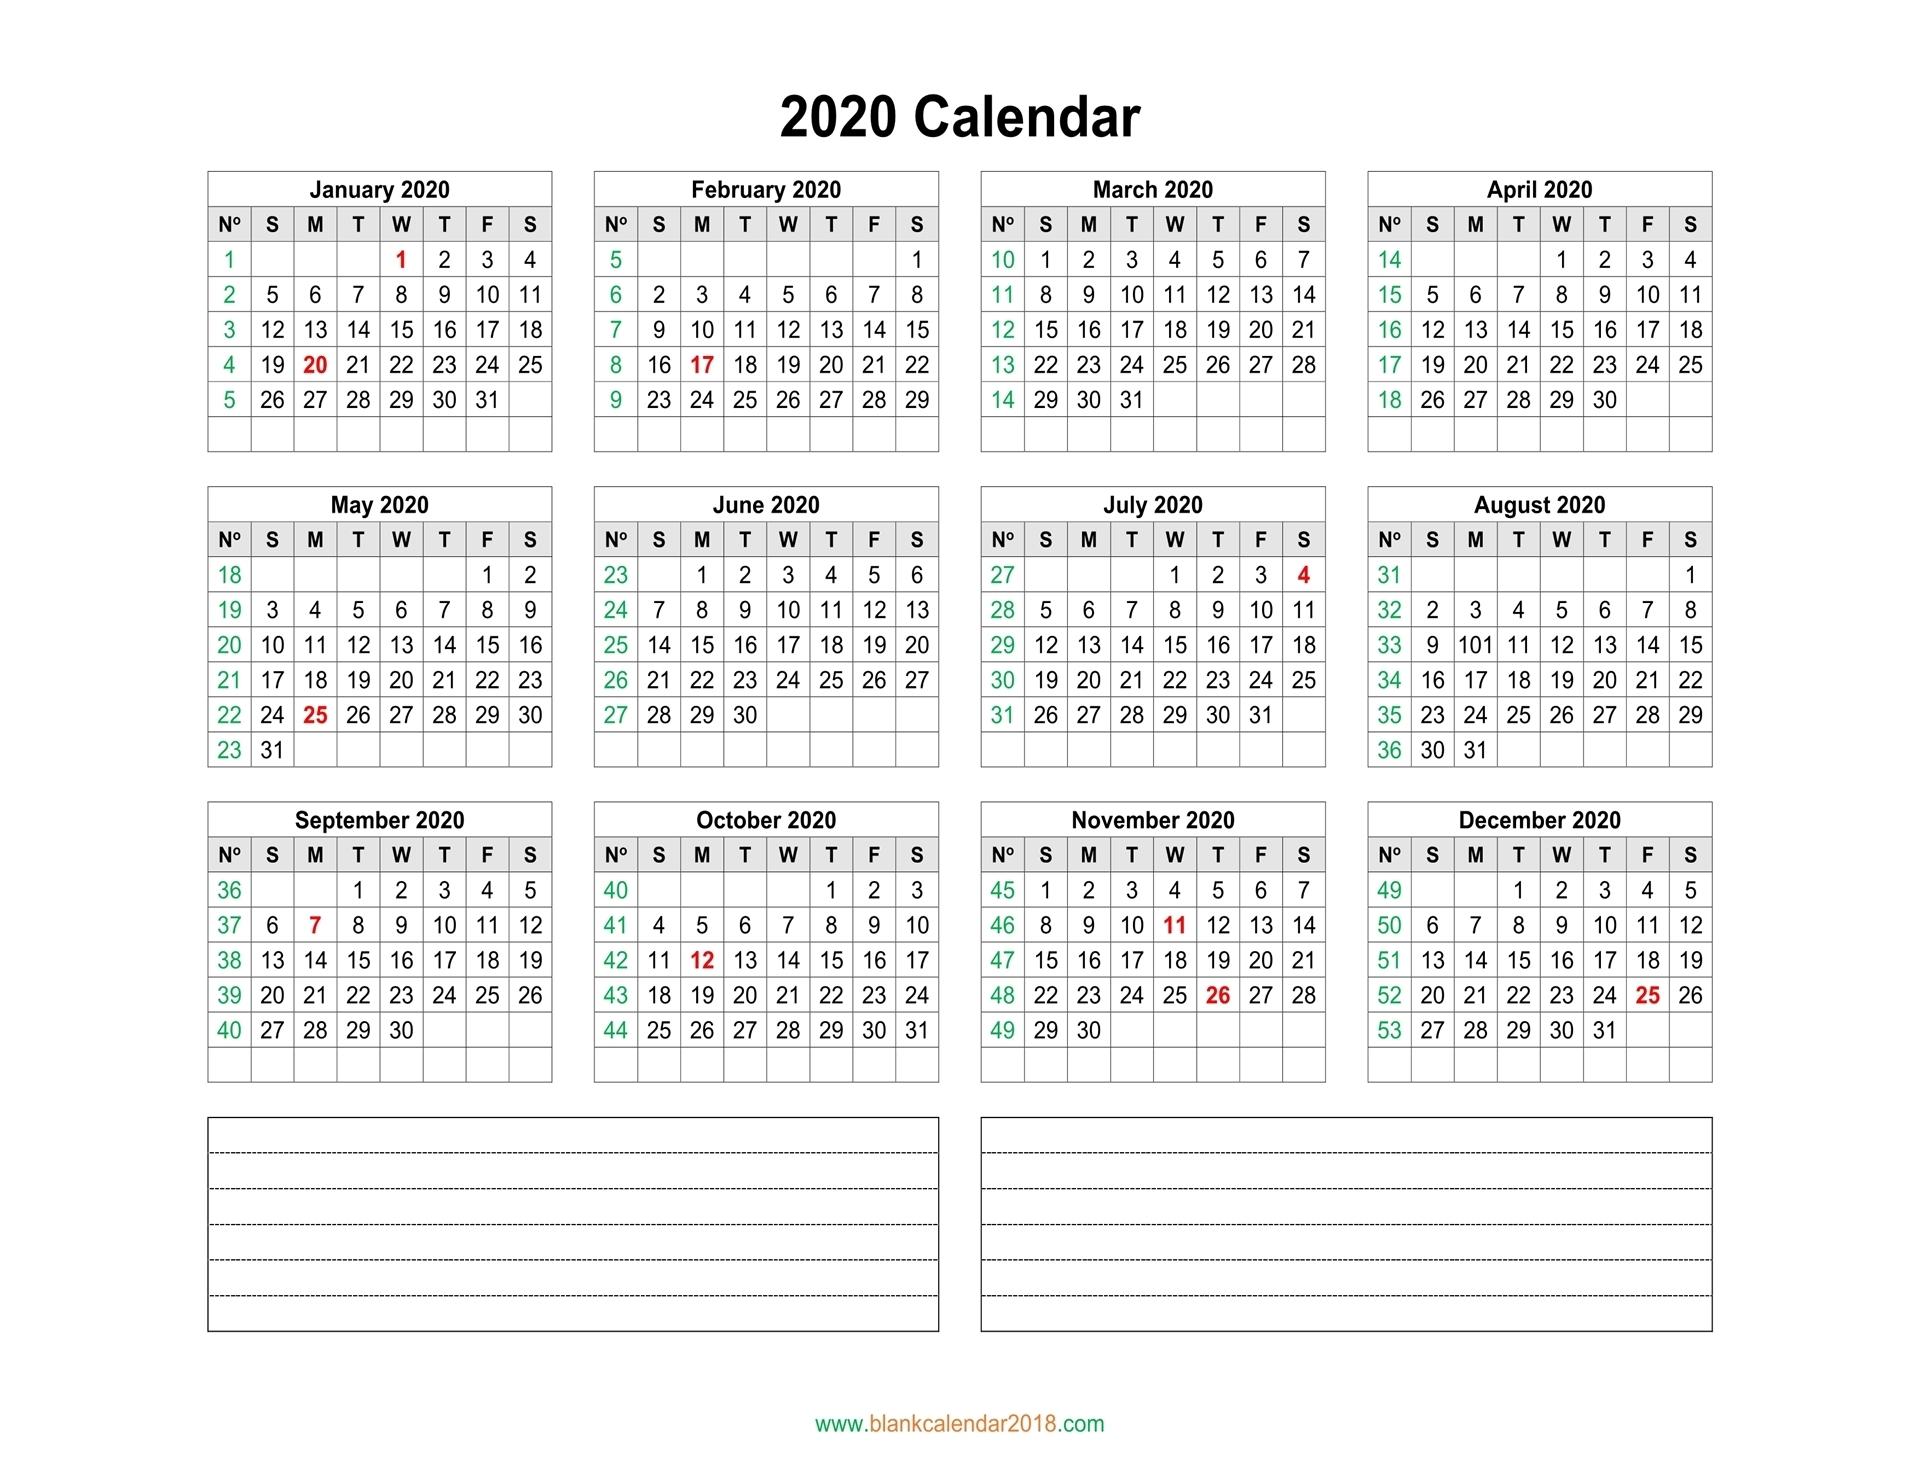 Blank Calendar 2020 in Blank Fill In Calendar 2020